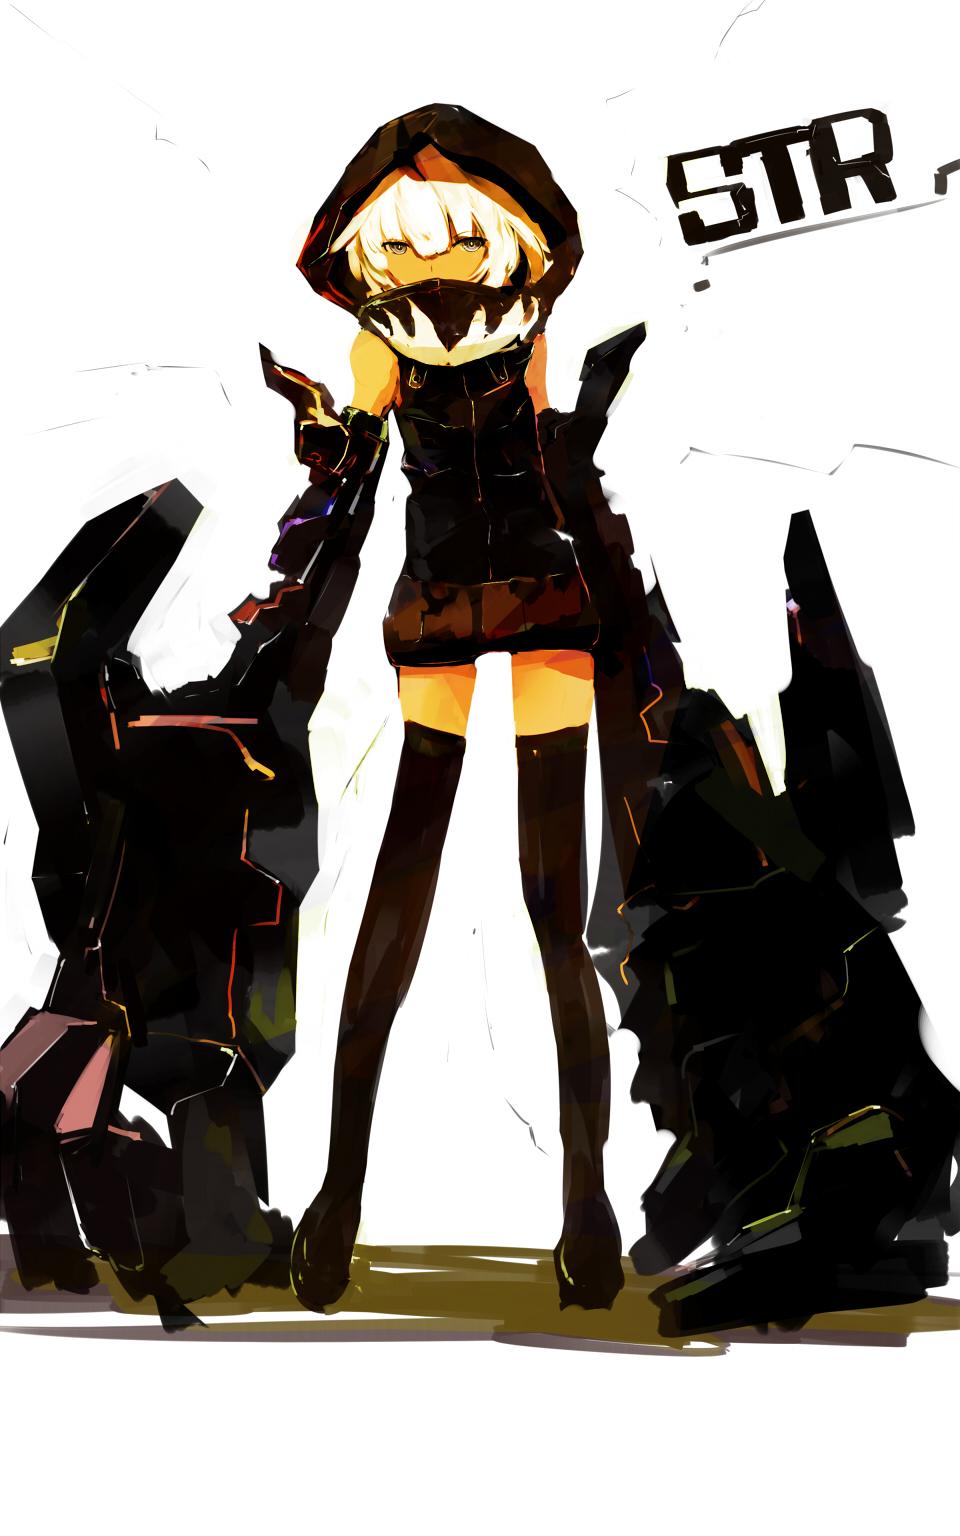 Anime World   U4e16 U754c U30a2 U30cb U30e1   Black Rock Shooter